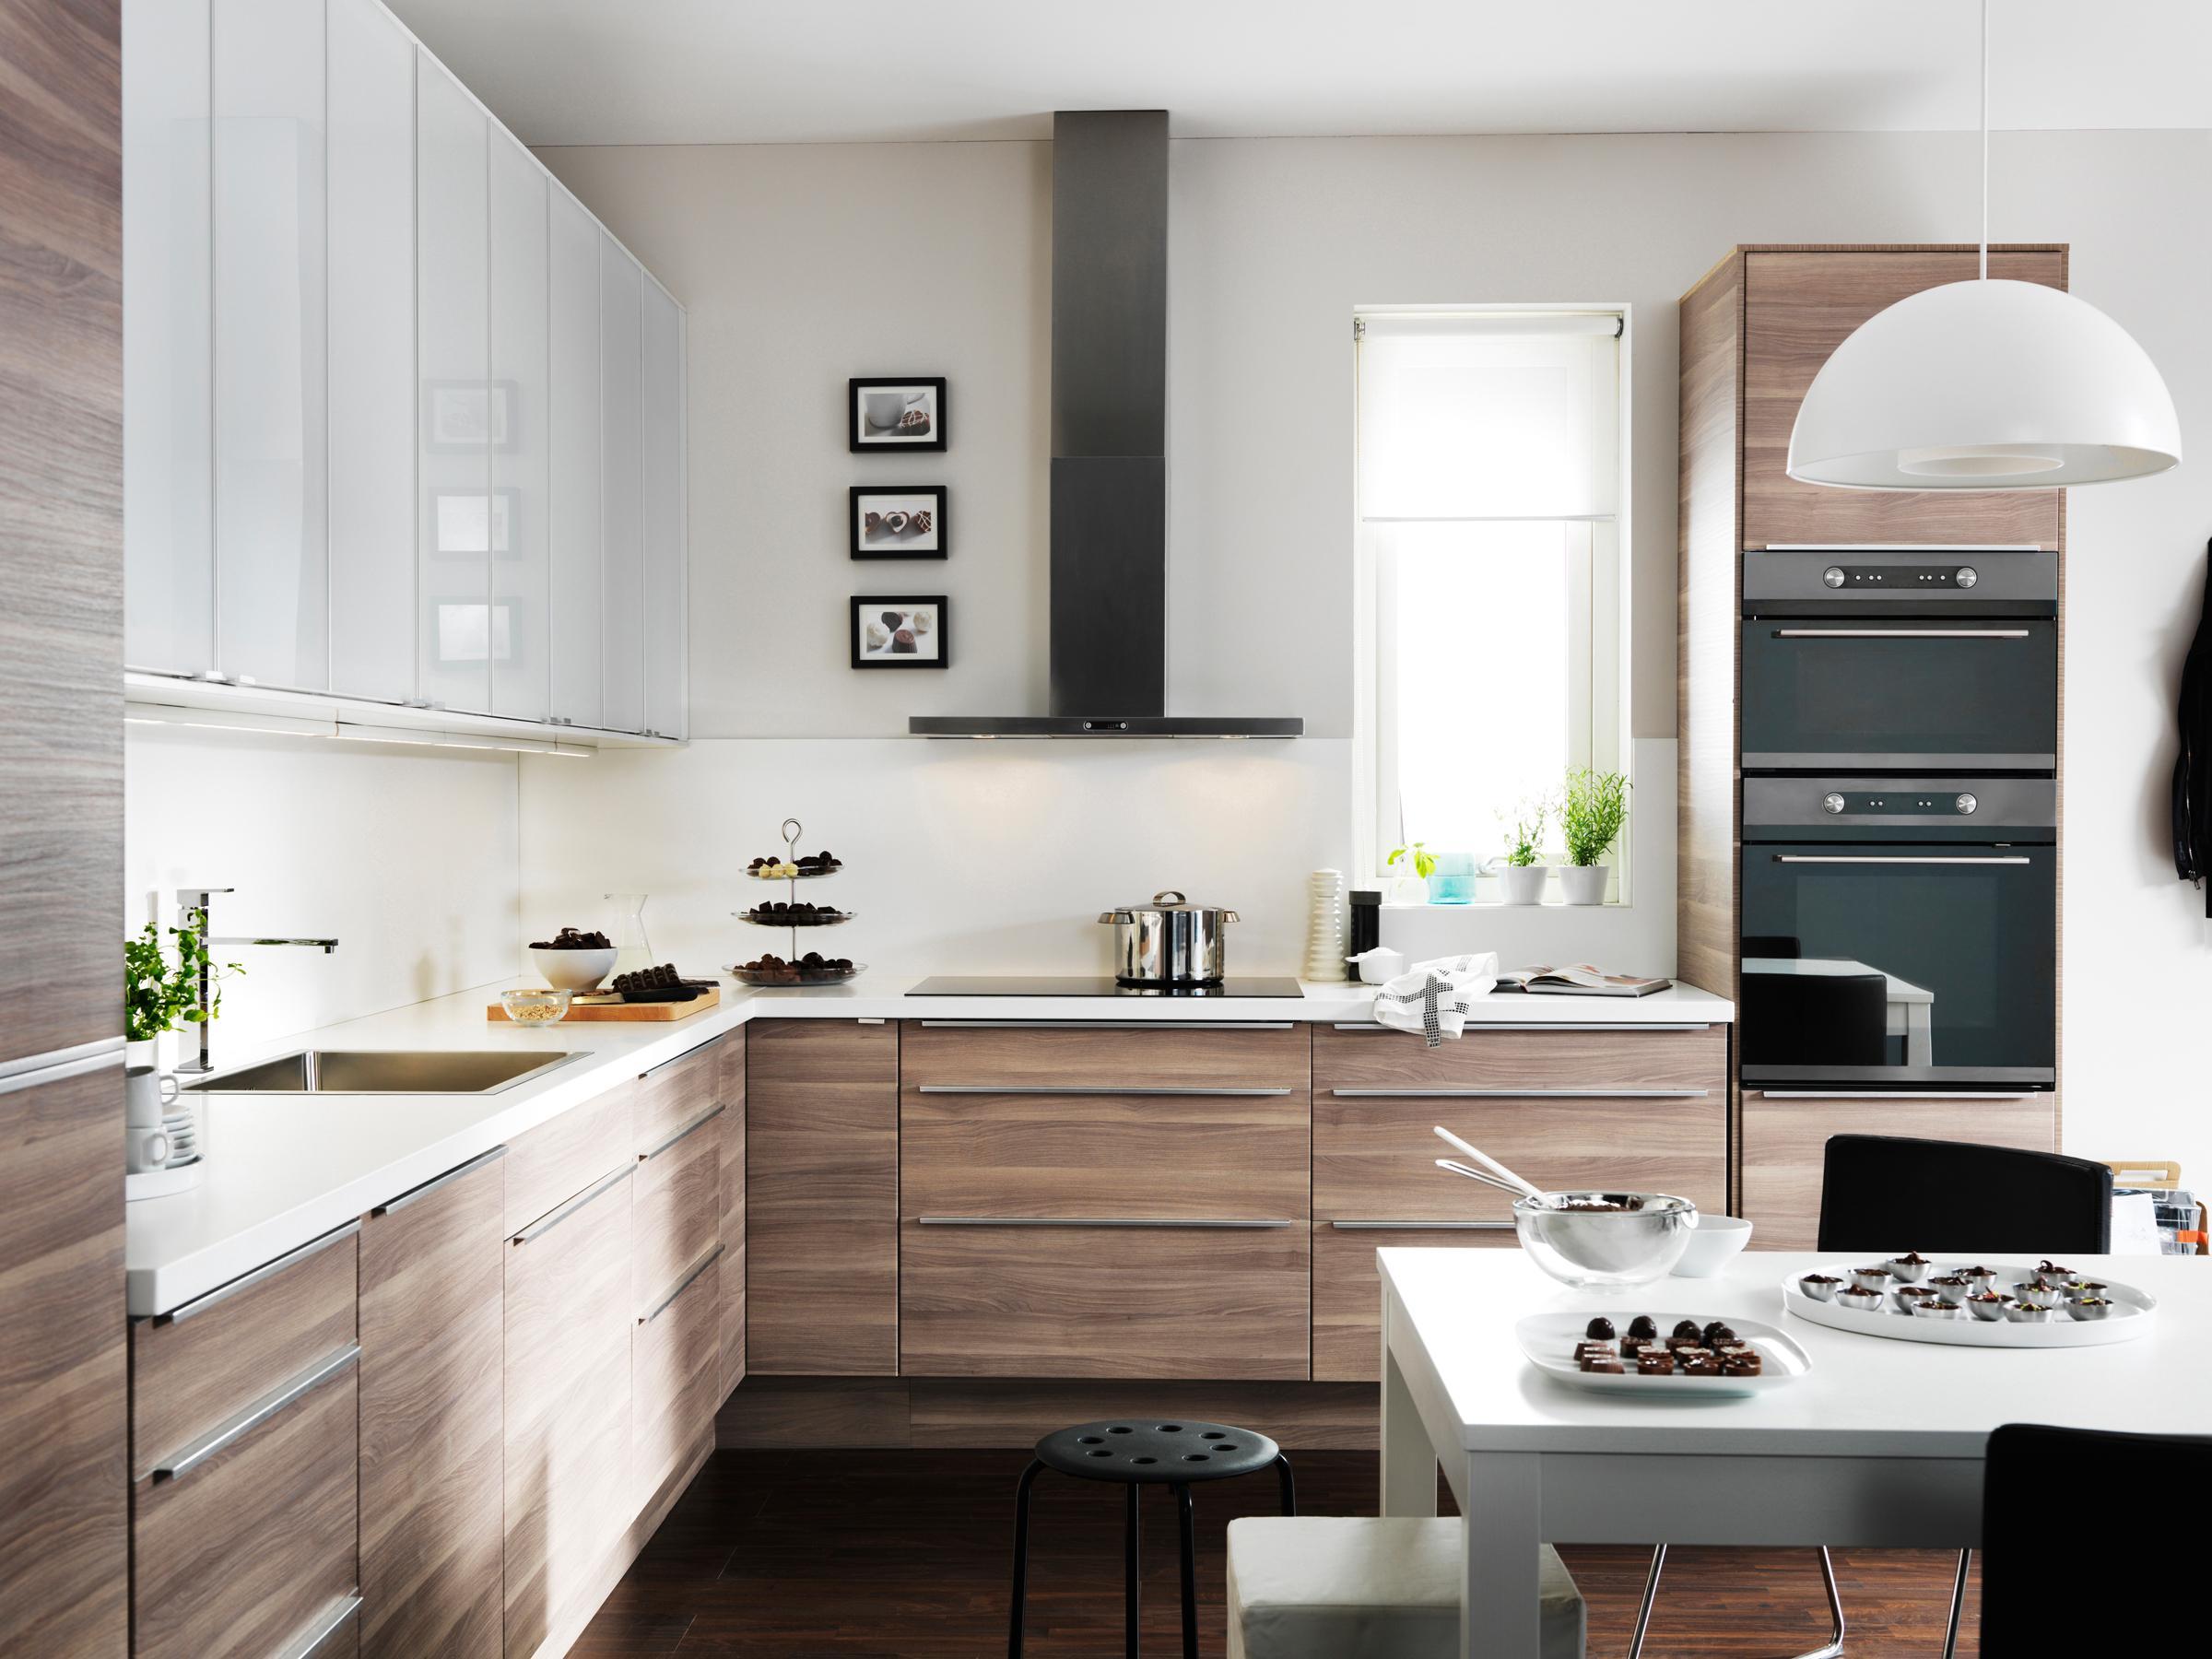 Ikea küche dunstabzug ubbalt küche ikea hessische frankfurt haus